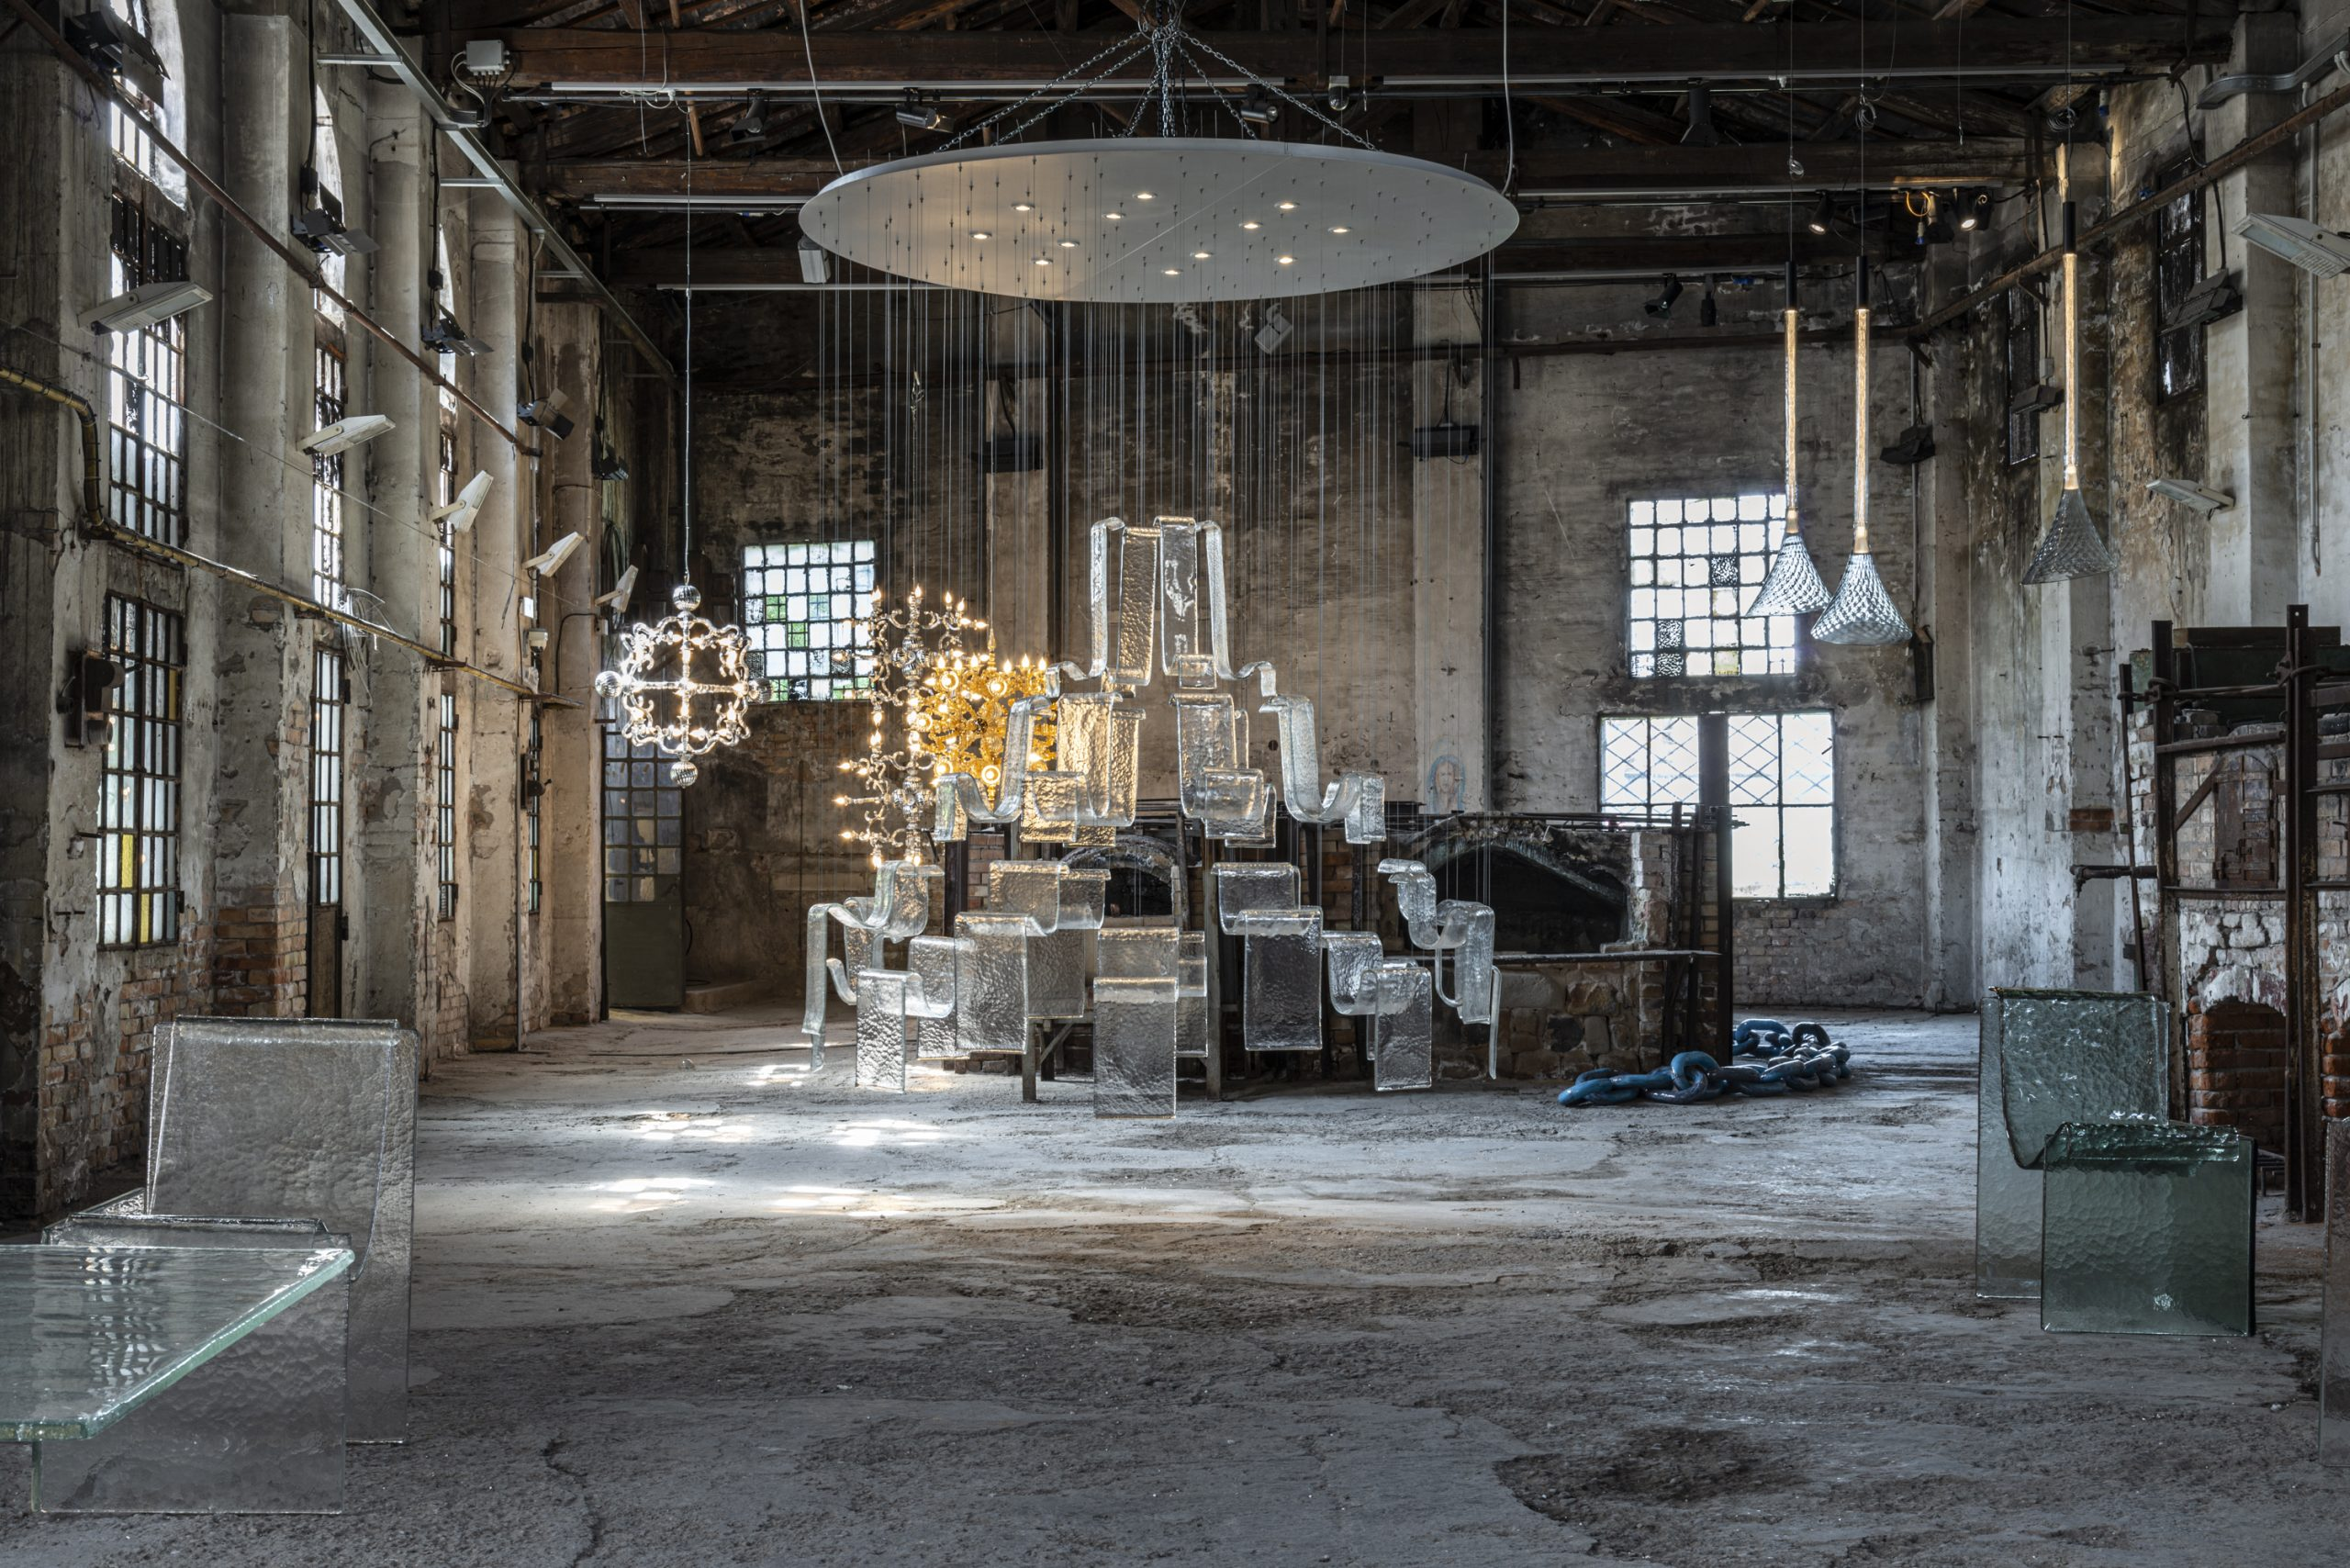 Exhibition-Overview-Room-07-@-Fondazione-Berengo-Art-Space-Murano-©-Leonardo-Duggento-01-1-scaled-1